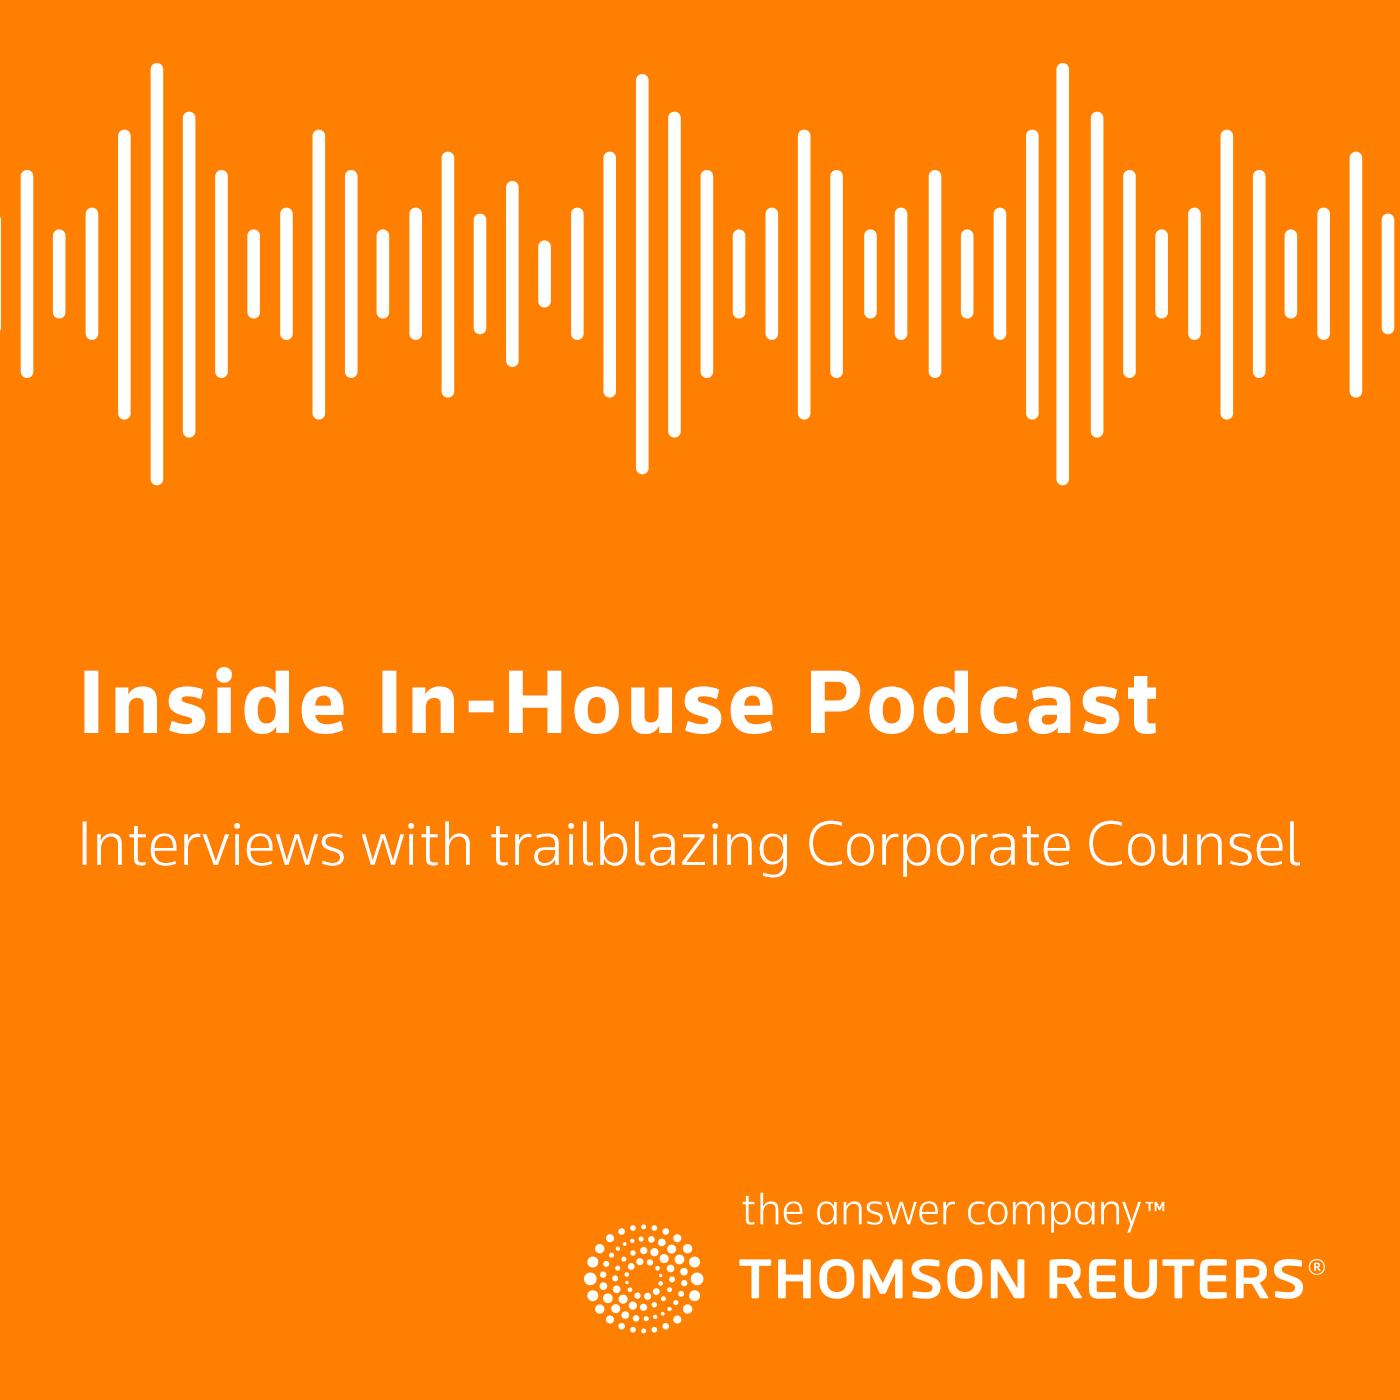 Artwork for podcast Inside In-House Podcast